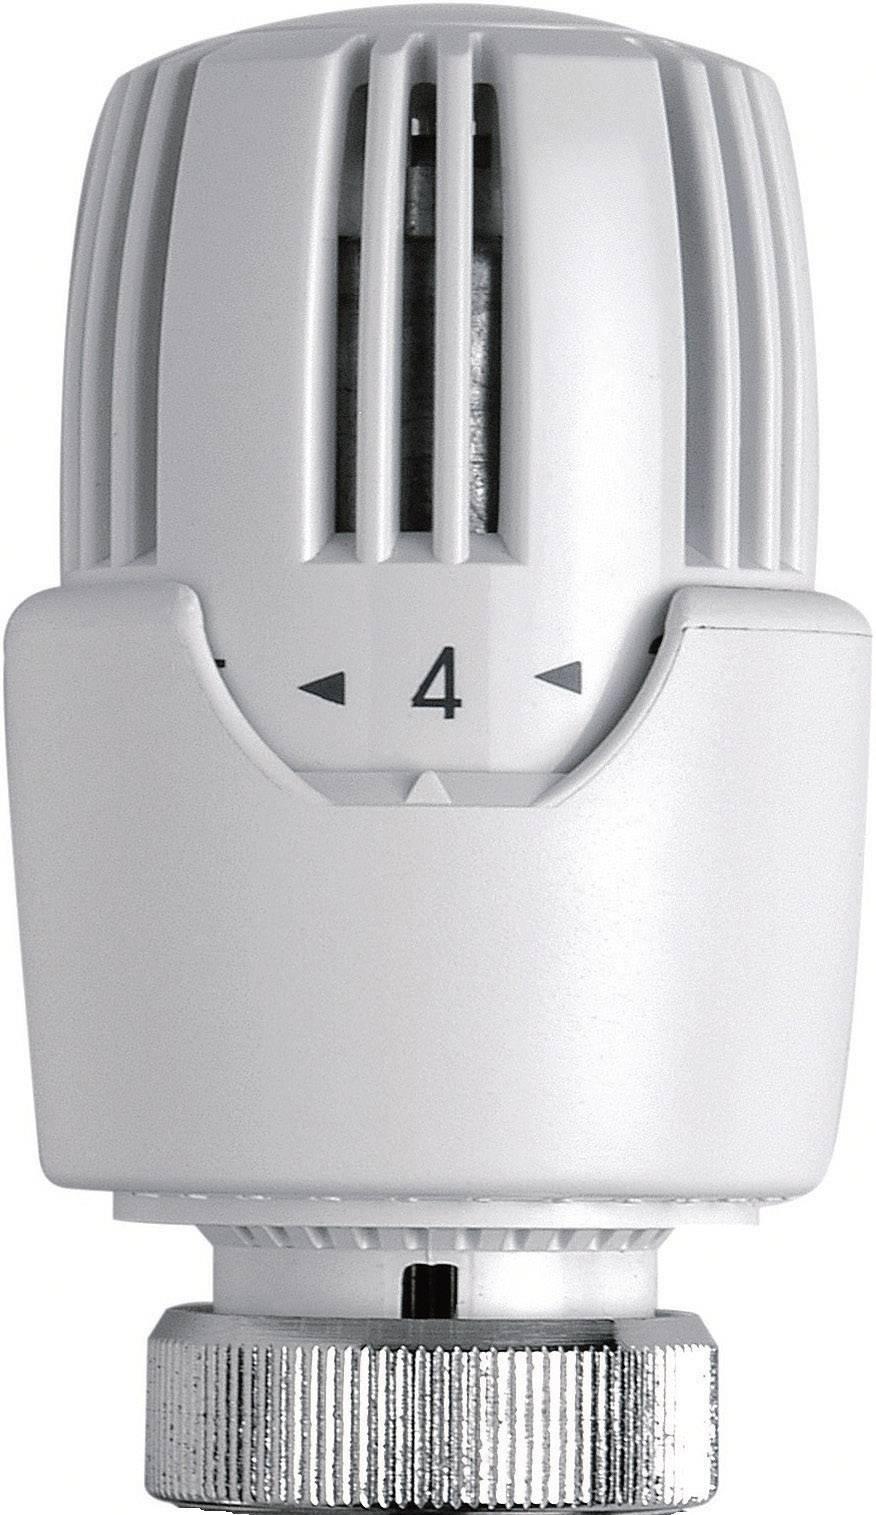 Radiátorová termostatická hlavica Eberle RT414 10 10 090, 7 do 31 °C